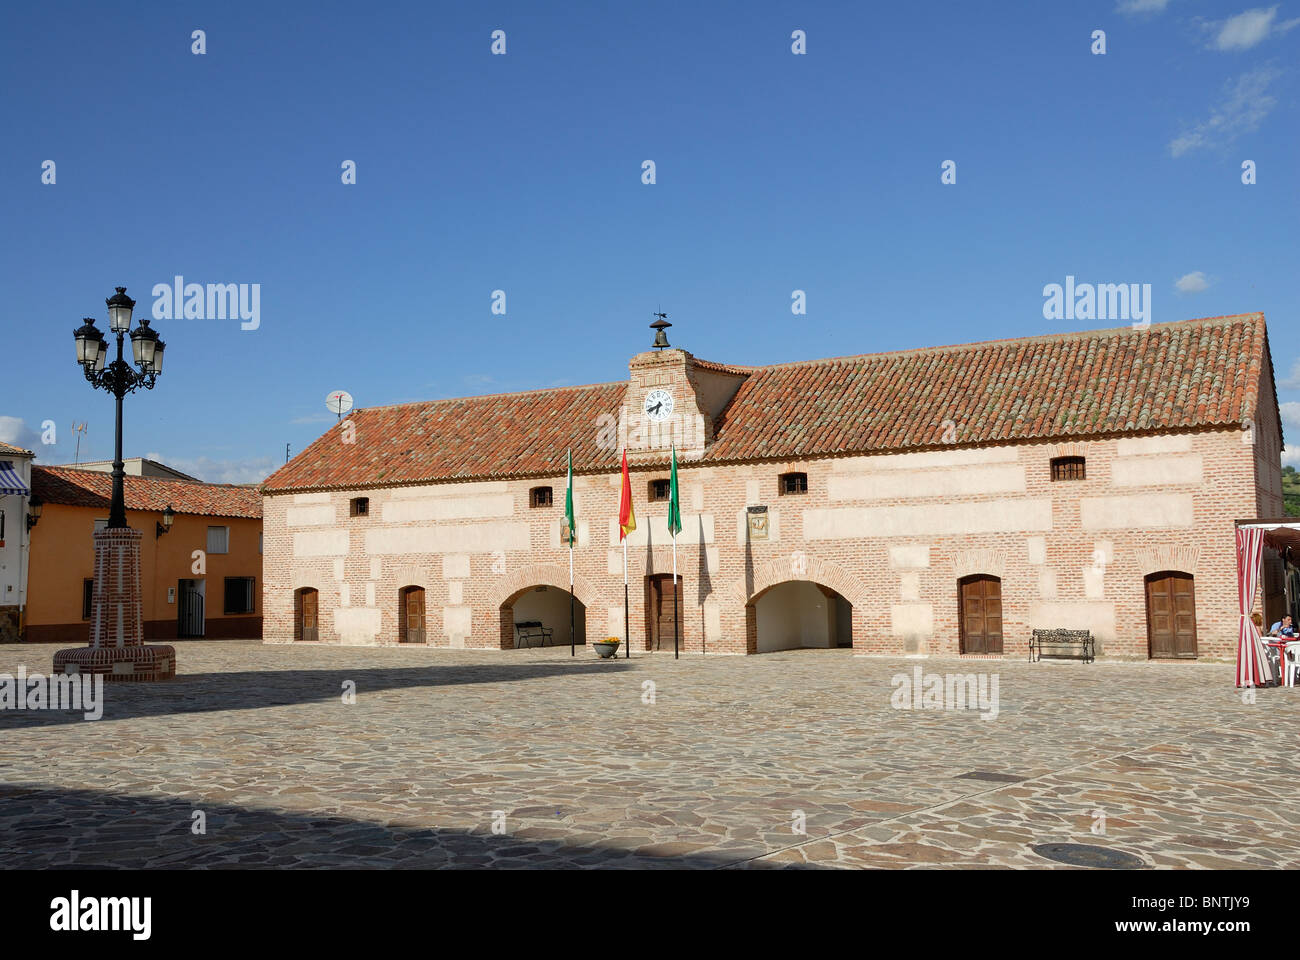 Aldeaquemada, Jaen, Andalucia, Spain White Village Pueblo blanco town hall Ayuntamiento village square Plaza - Stock Image